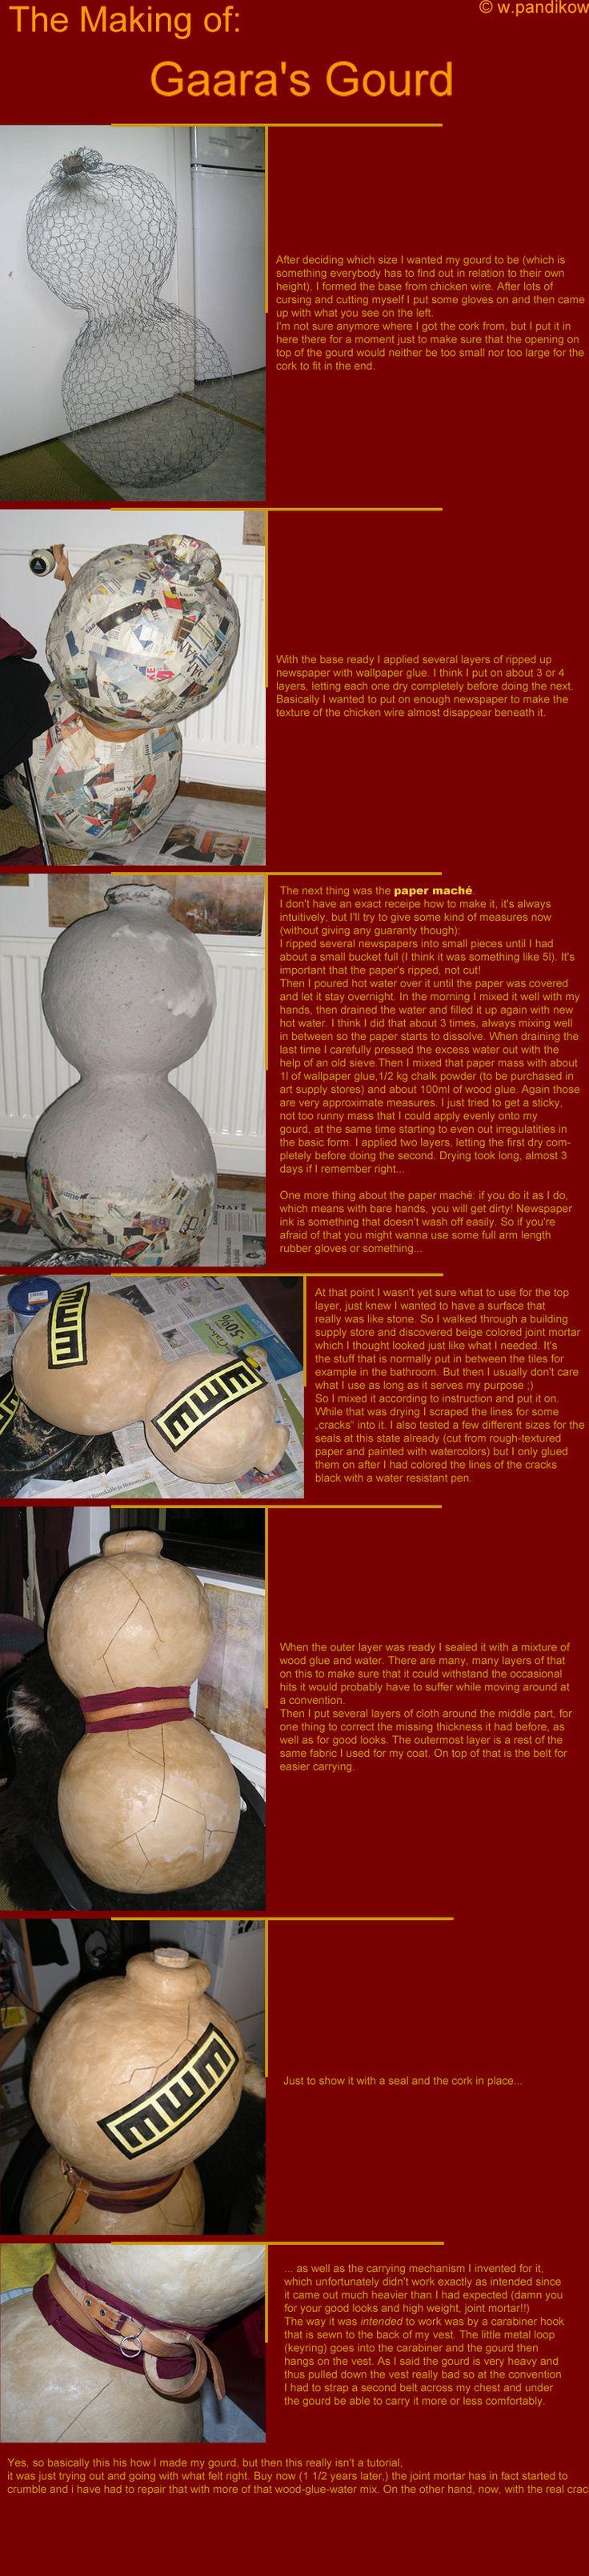 Gaara's Gourd.     http://thunderssilence.deviantart.com/art/The-Making-of-Gaara-s-Gourd-143691892